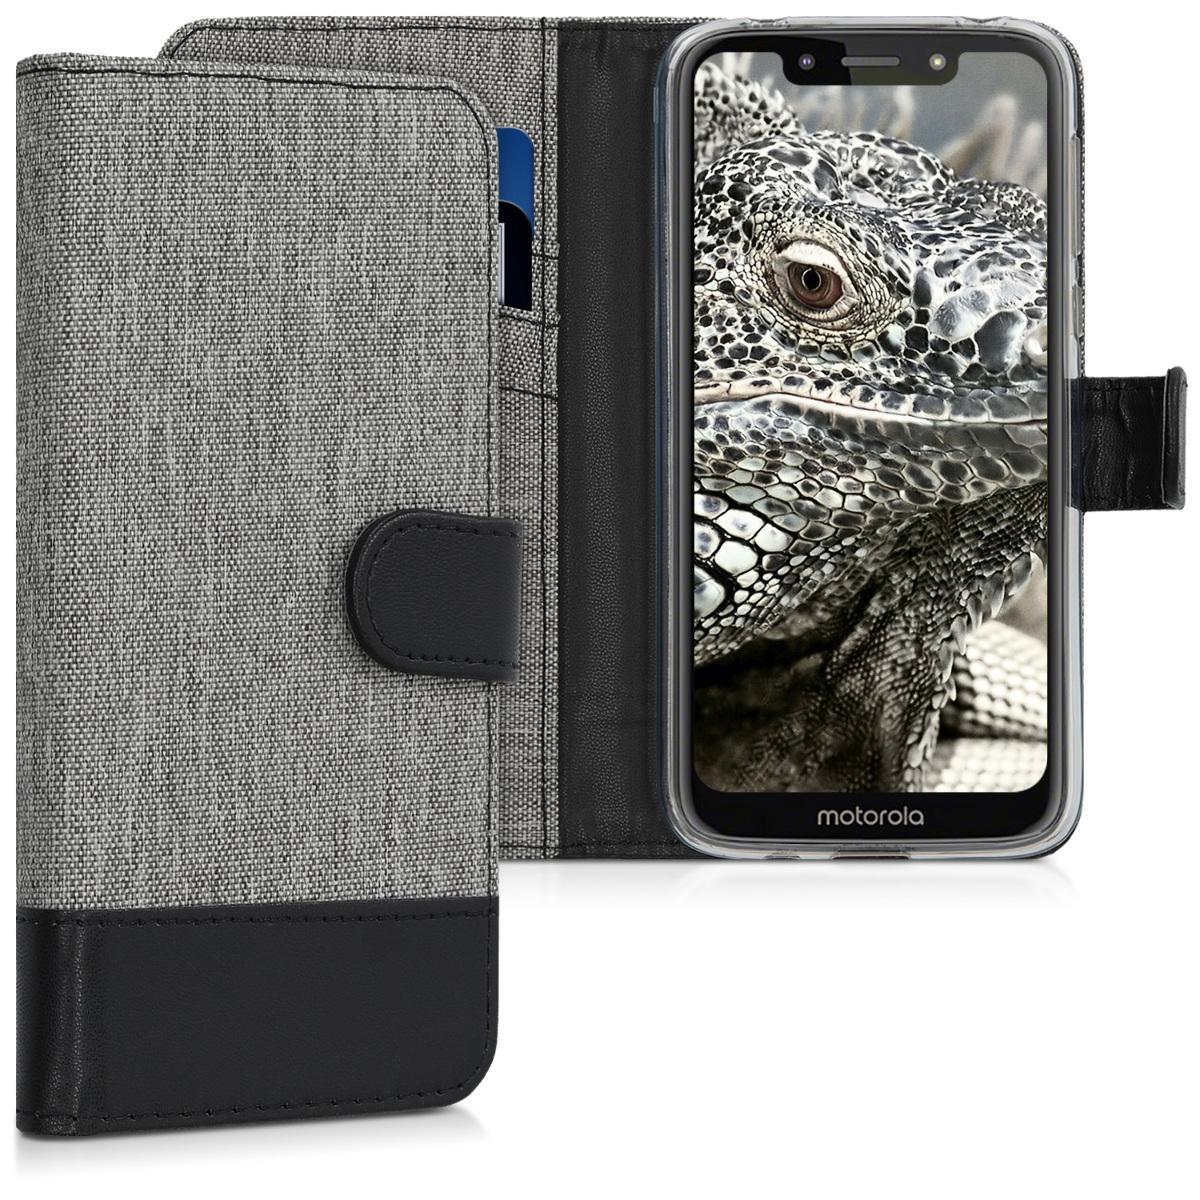 KW Θήκη Πορτοφόλι Motorola Moto G7 Play - Grey / Black (47755.01)